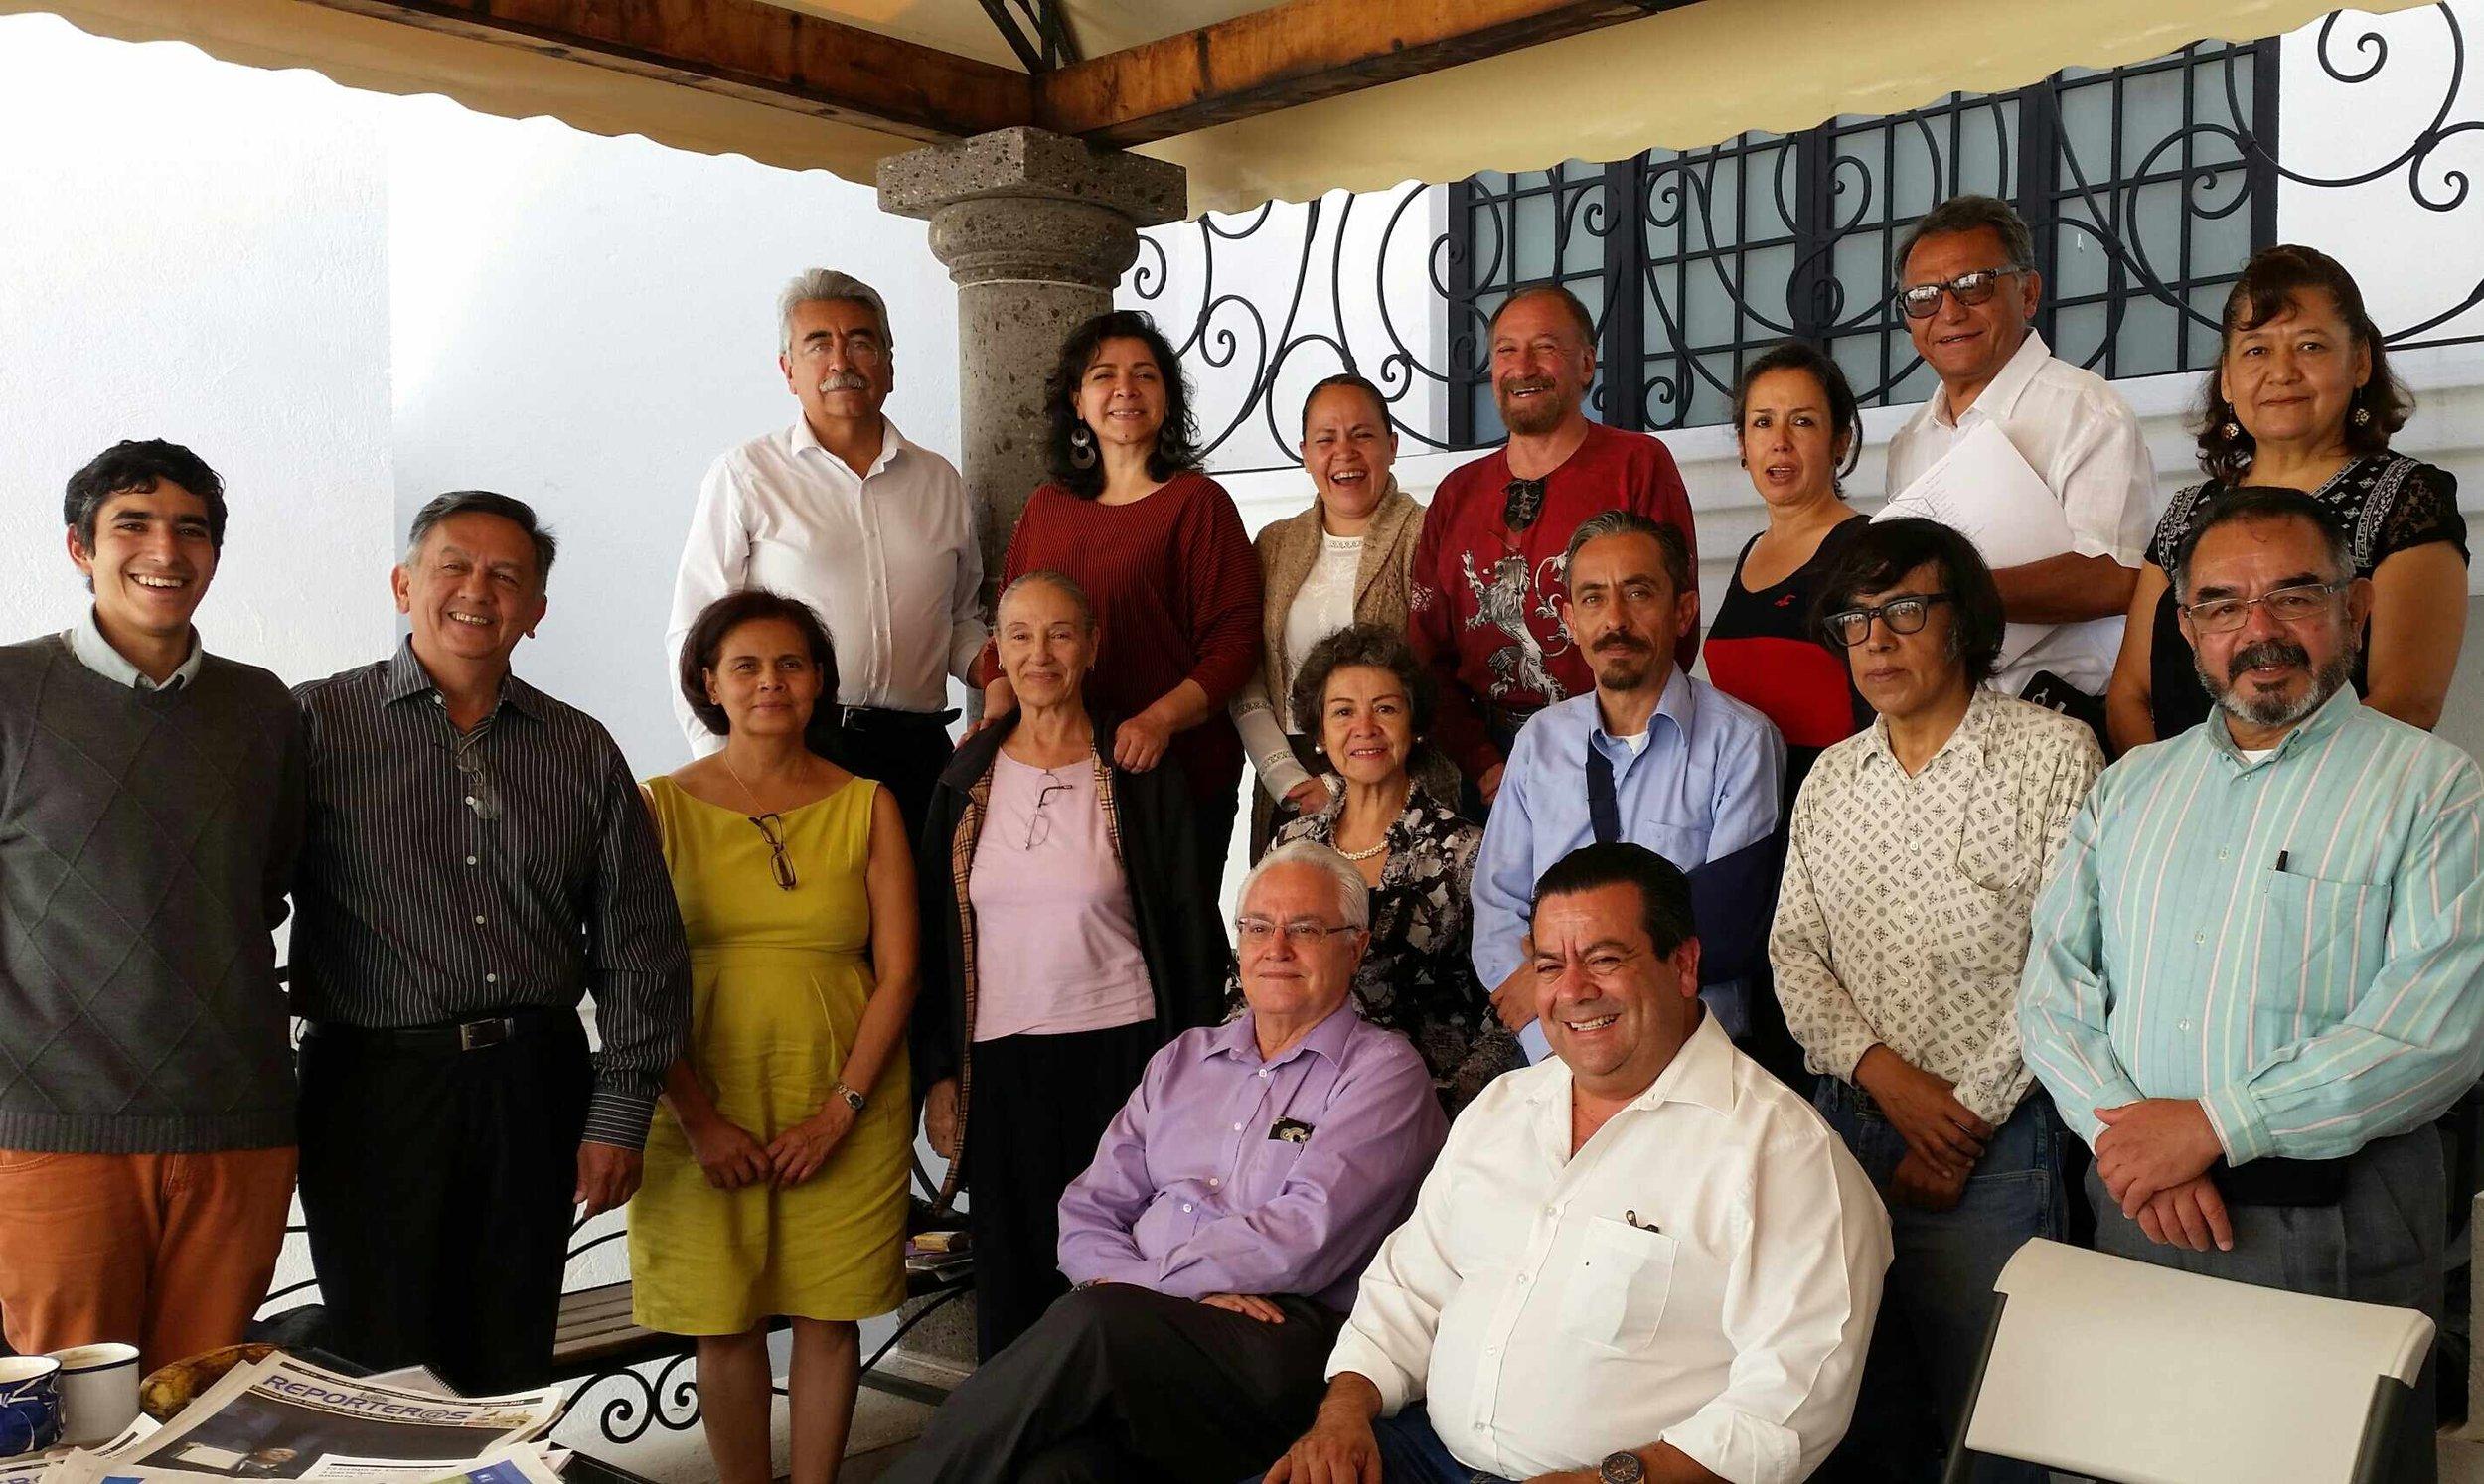 Grupo Efemerides, Foro Cultural 81